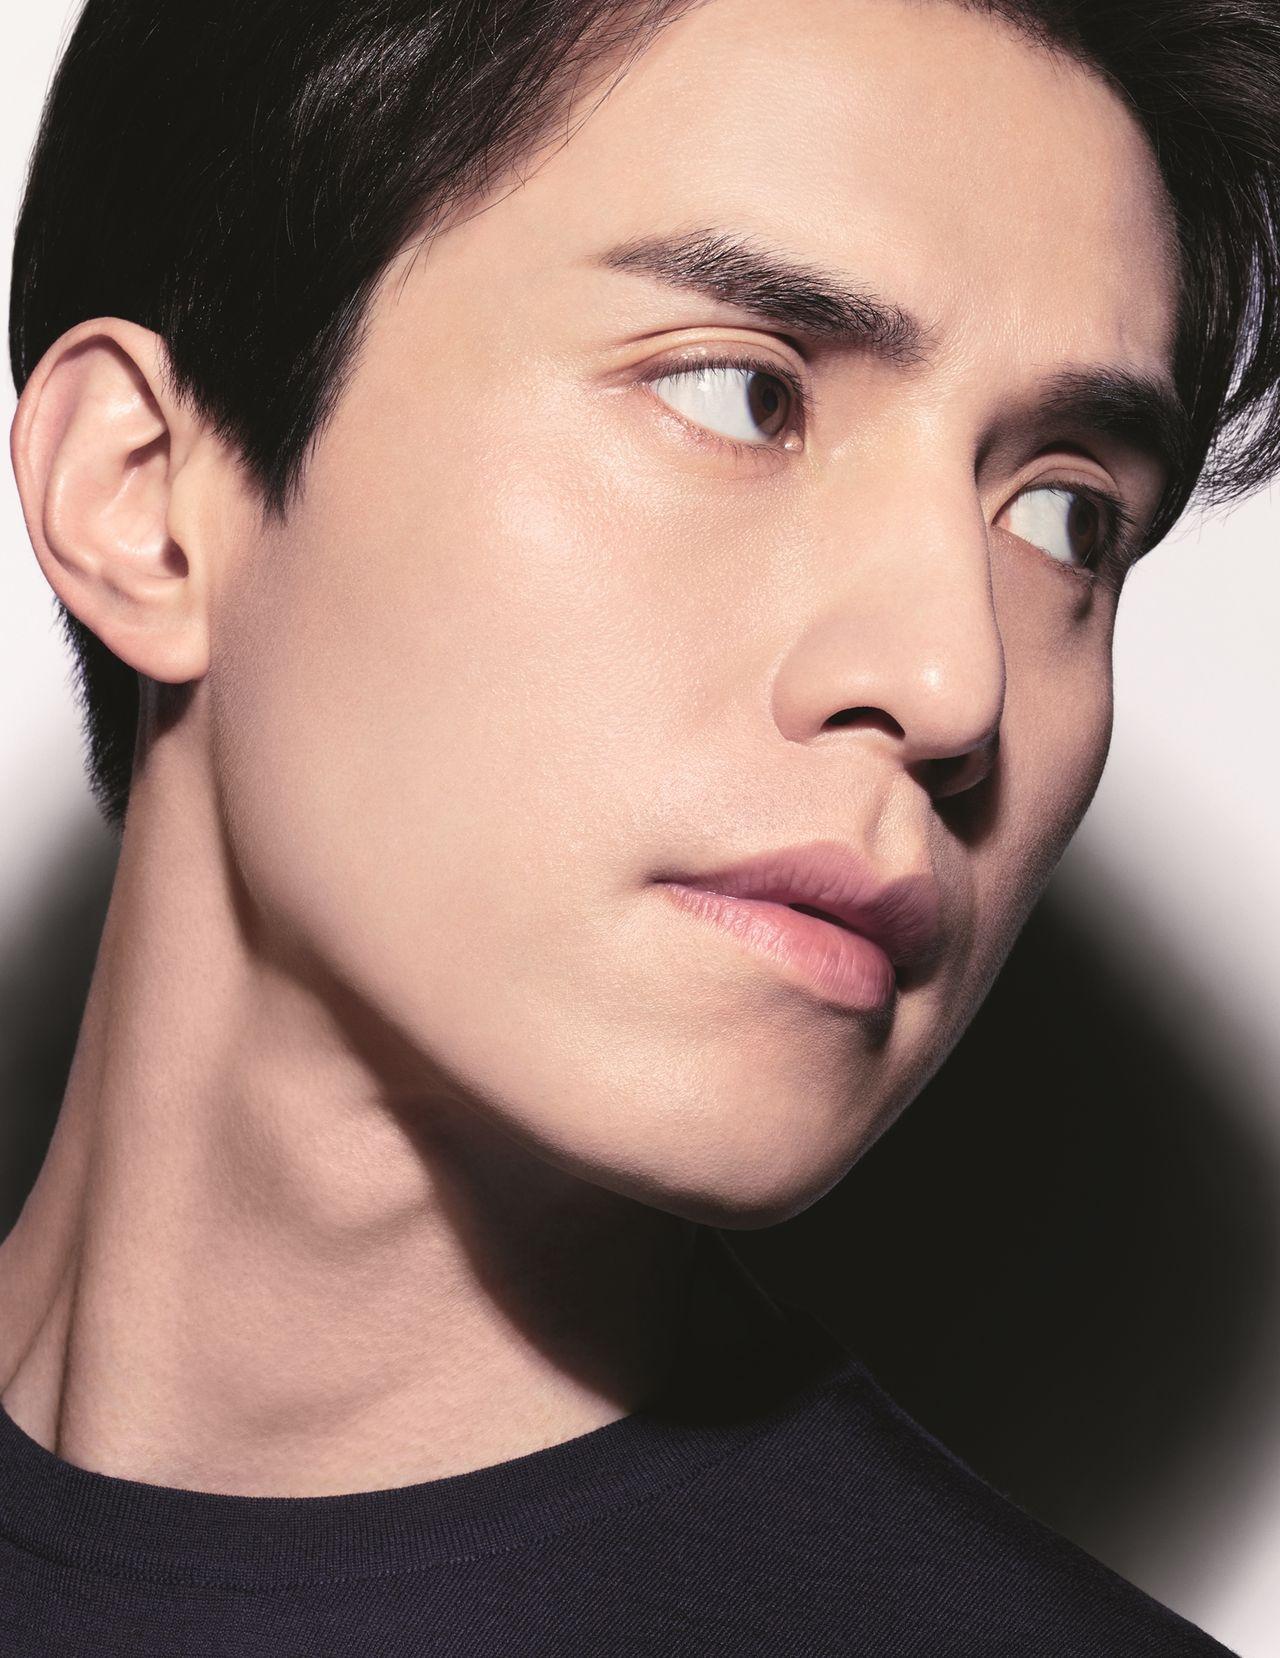 c69475998f52 Chanel introduces Boy de Chanel its first makeup line for men | News ...